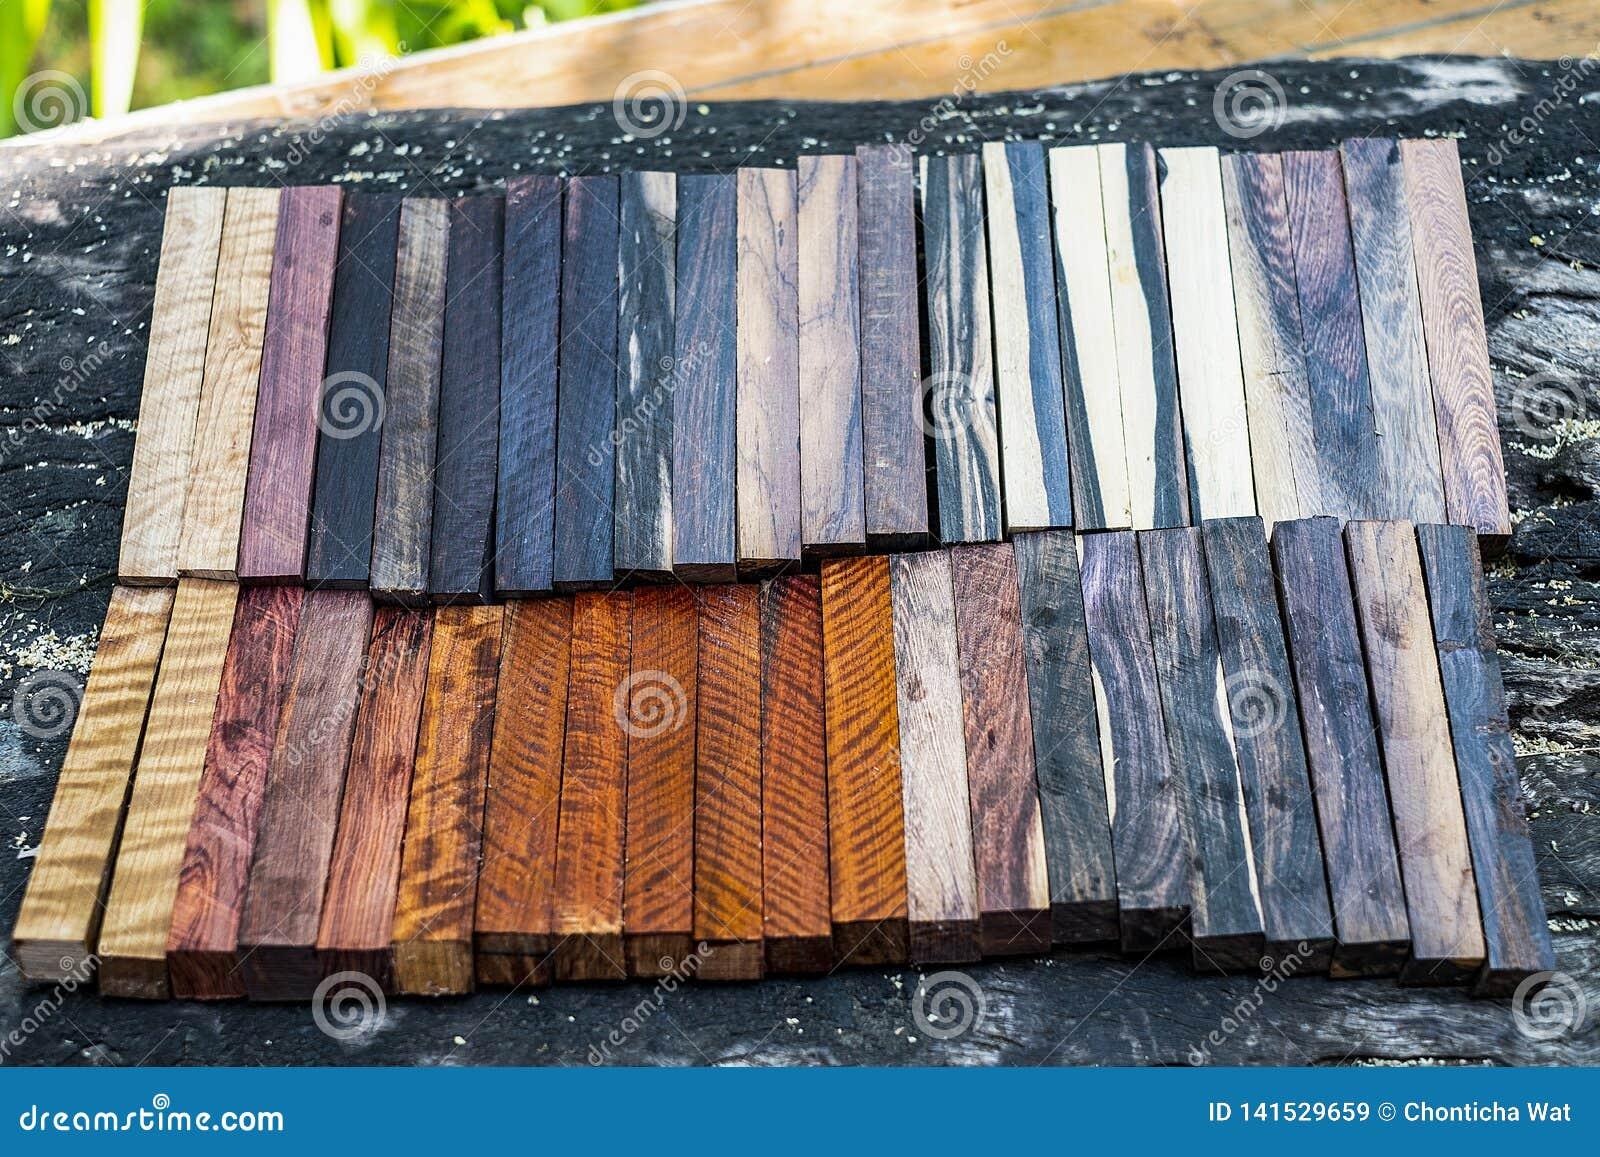 Set Exotic wood real stock image  Image of marble, black - 141529659